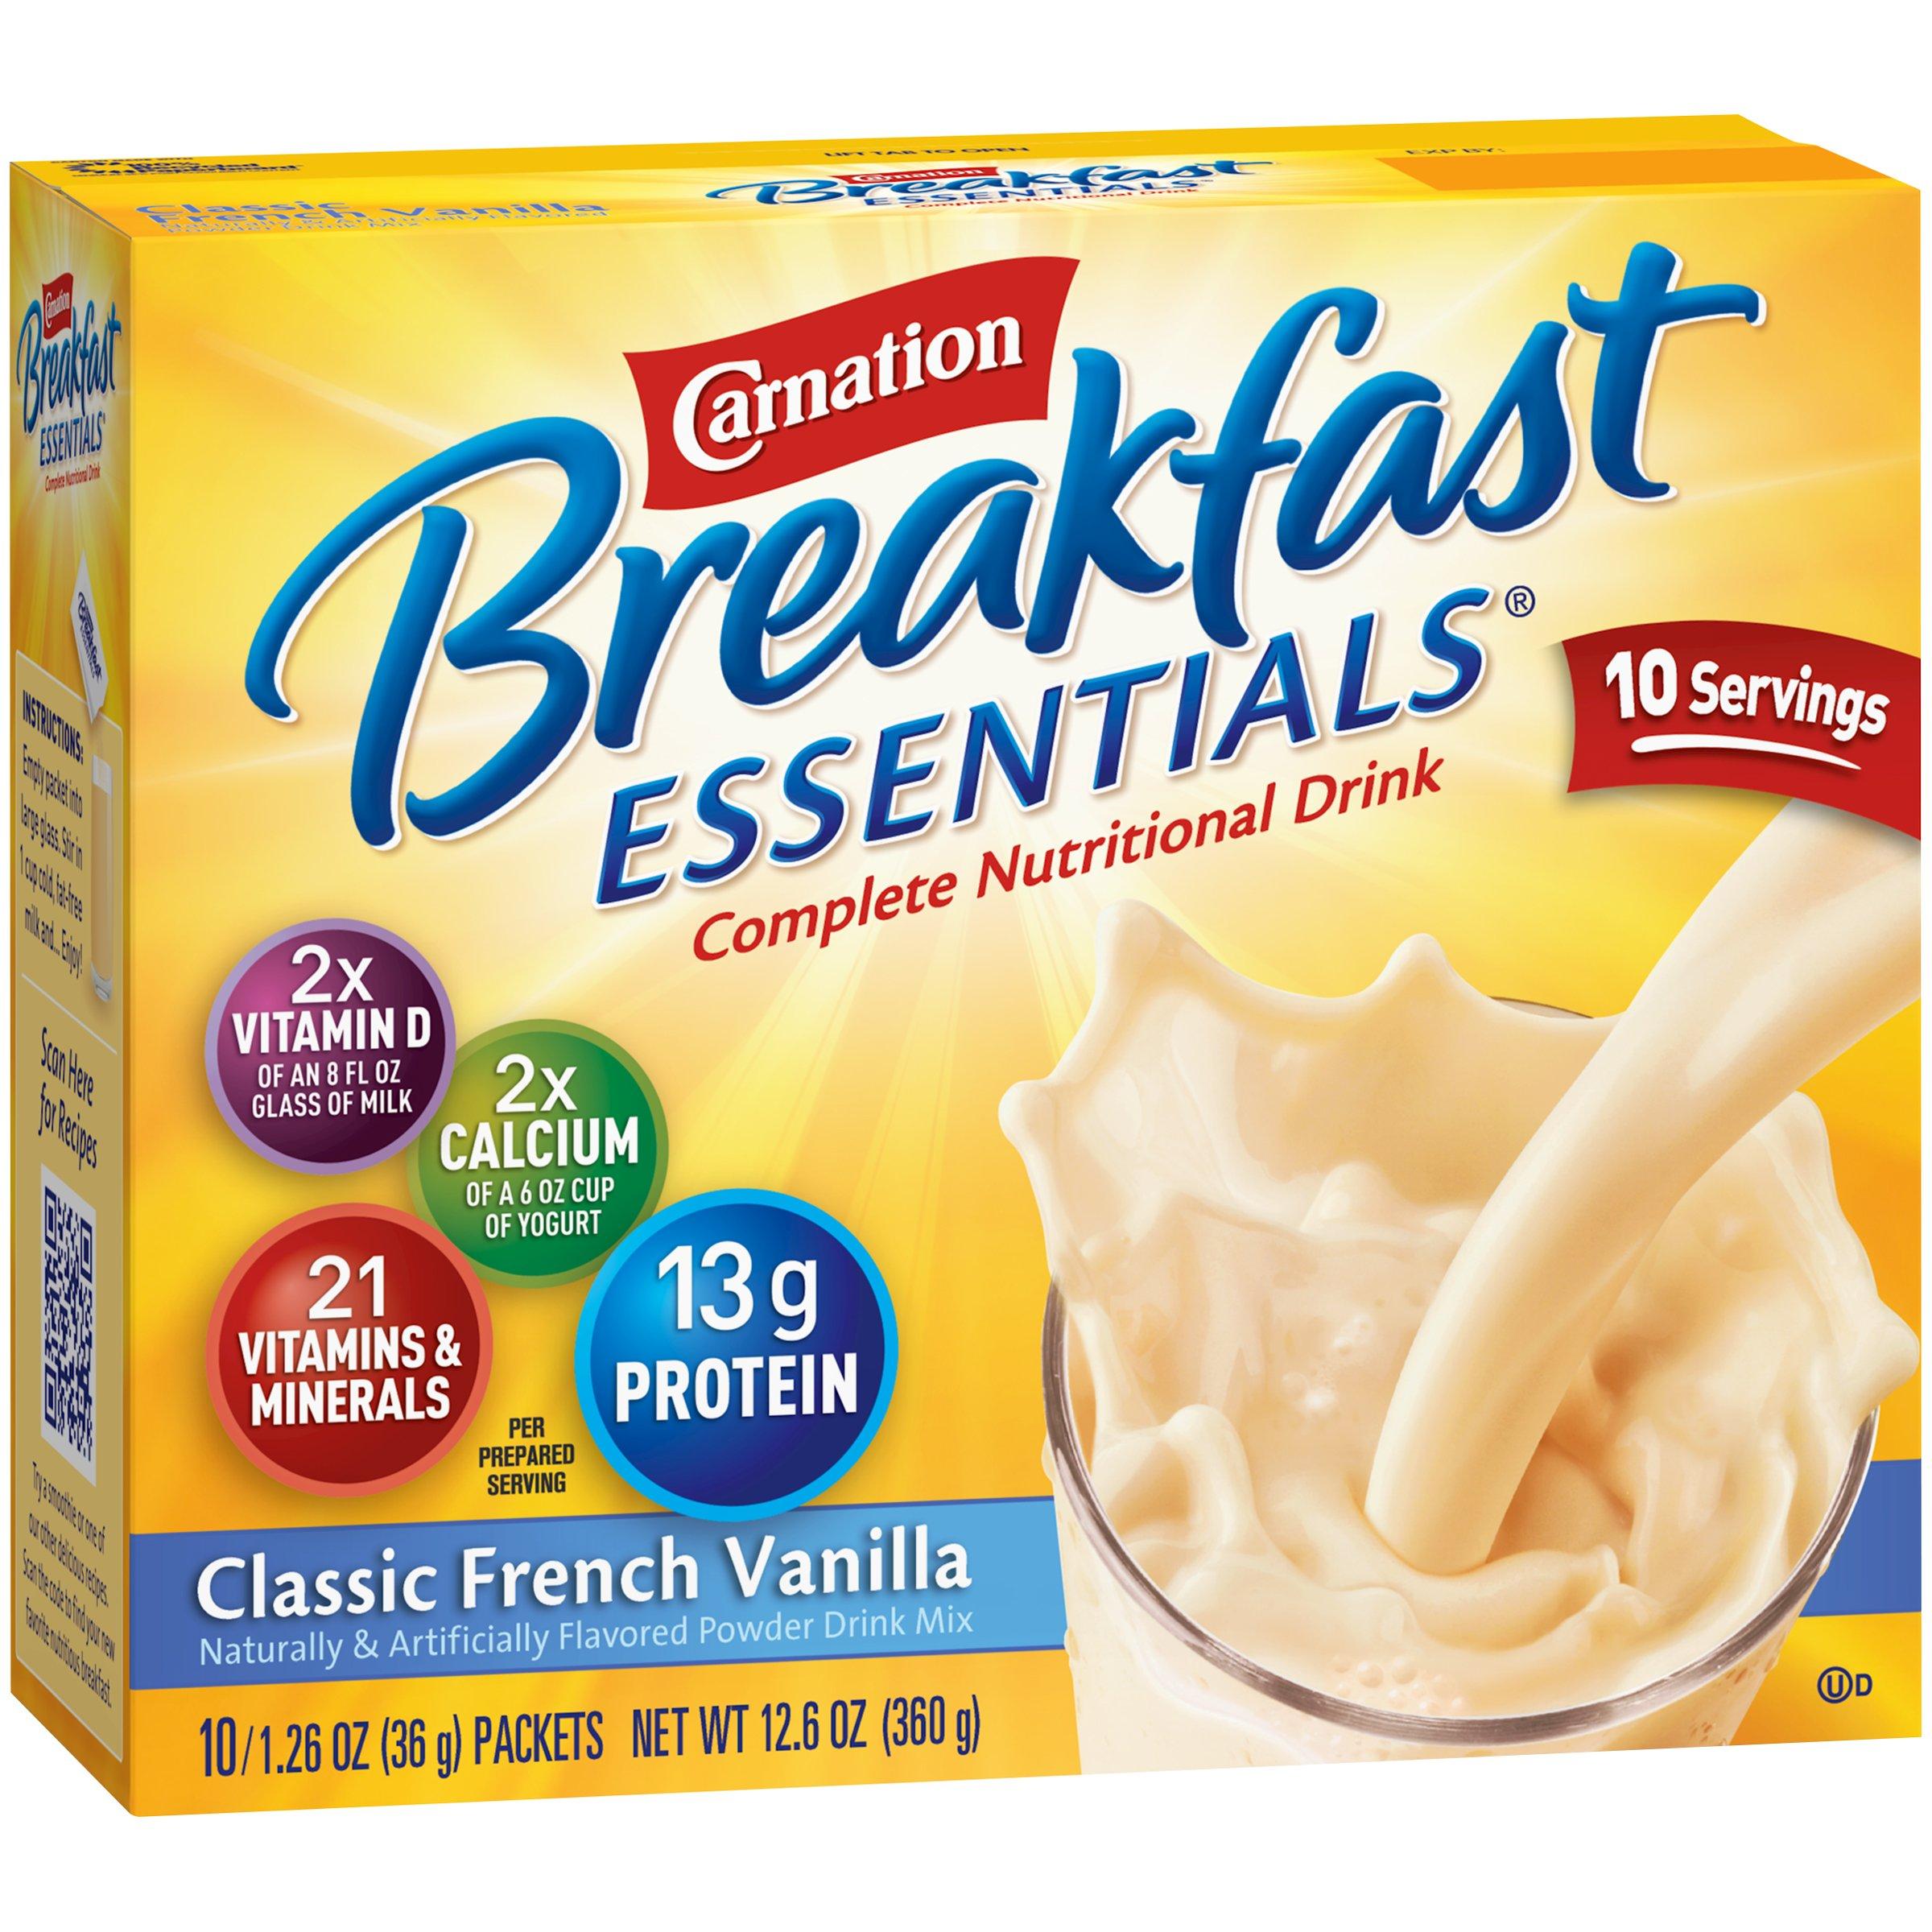 Carnation Breakfast Essentials Powder Drink Mix, Classic French Vanilla, Box of 10 Packets